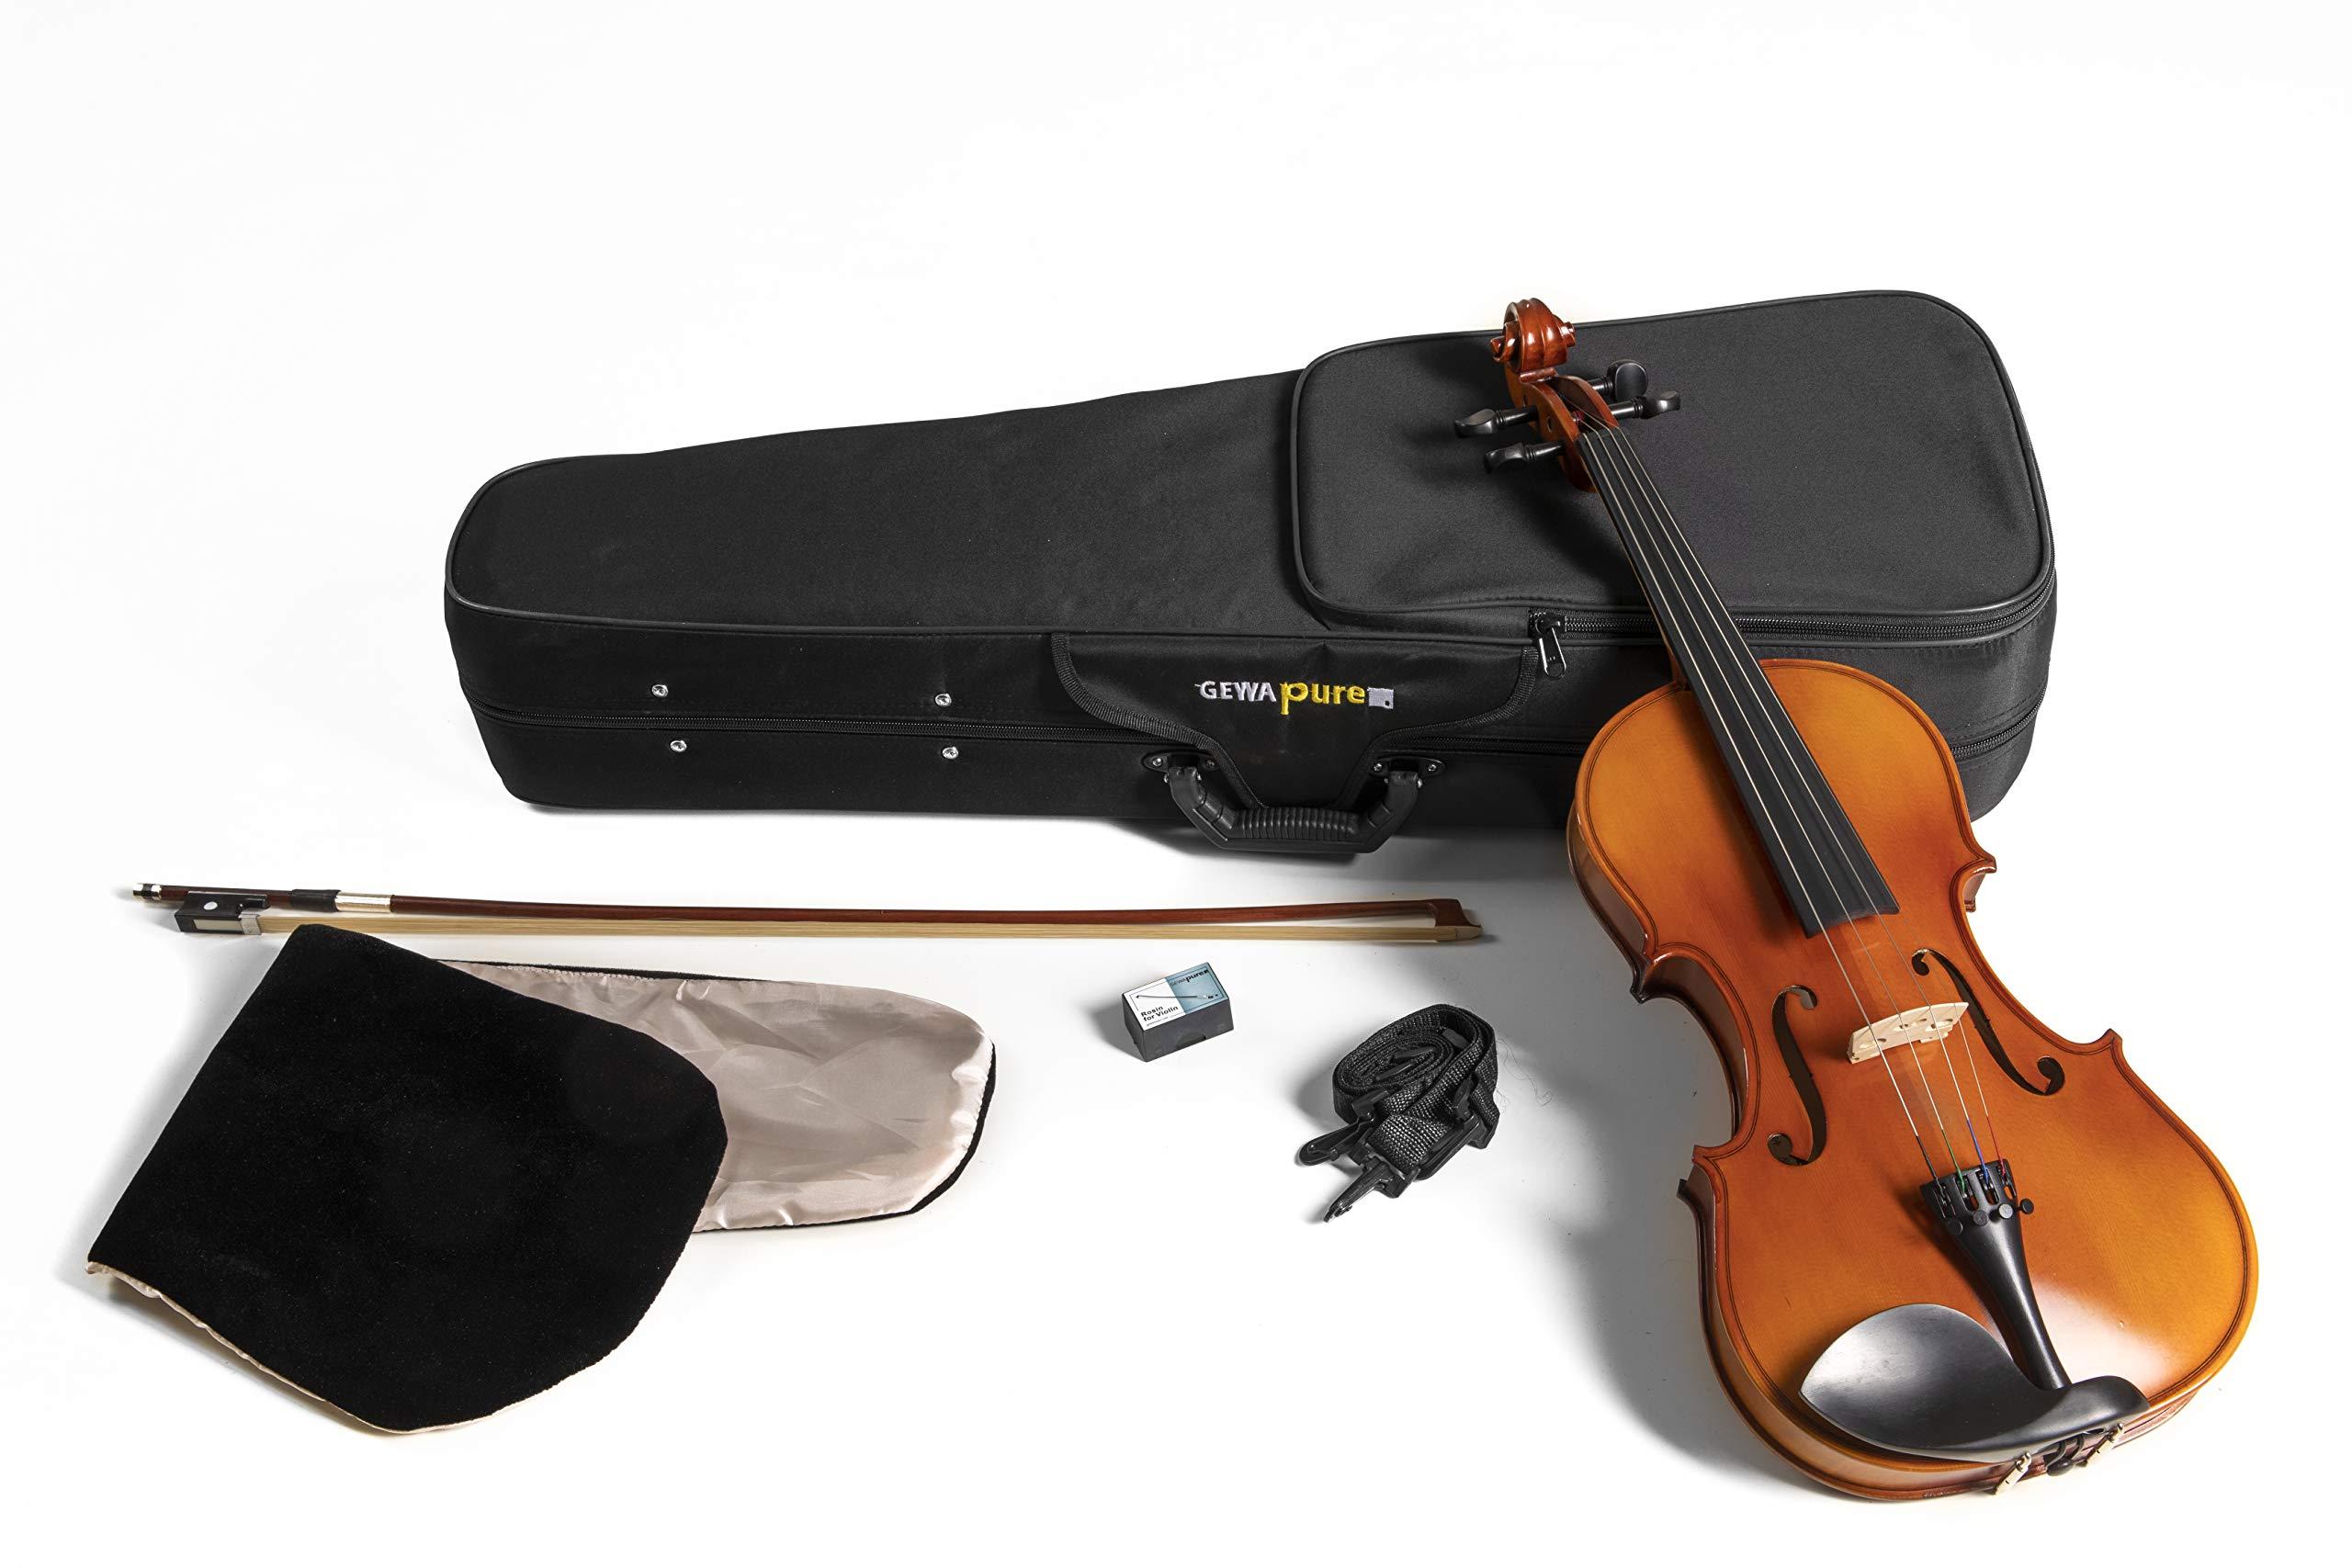 GEWApure Viola Set EW Ebano 38,2 cm Montado con Barbada, Cordal con microafinador, Arco, Resina, Estuche con Bandolera: Amazon.es: Instrumentos musicales